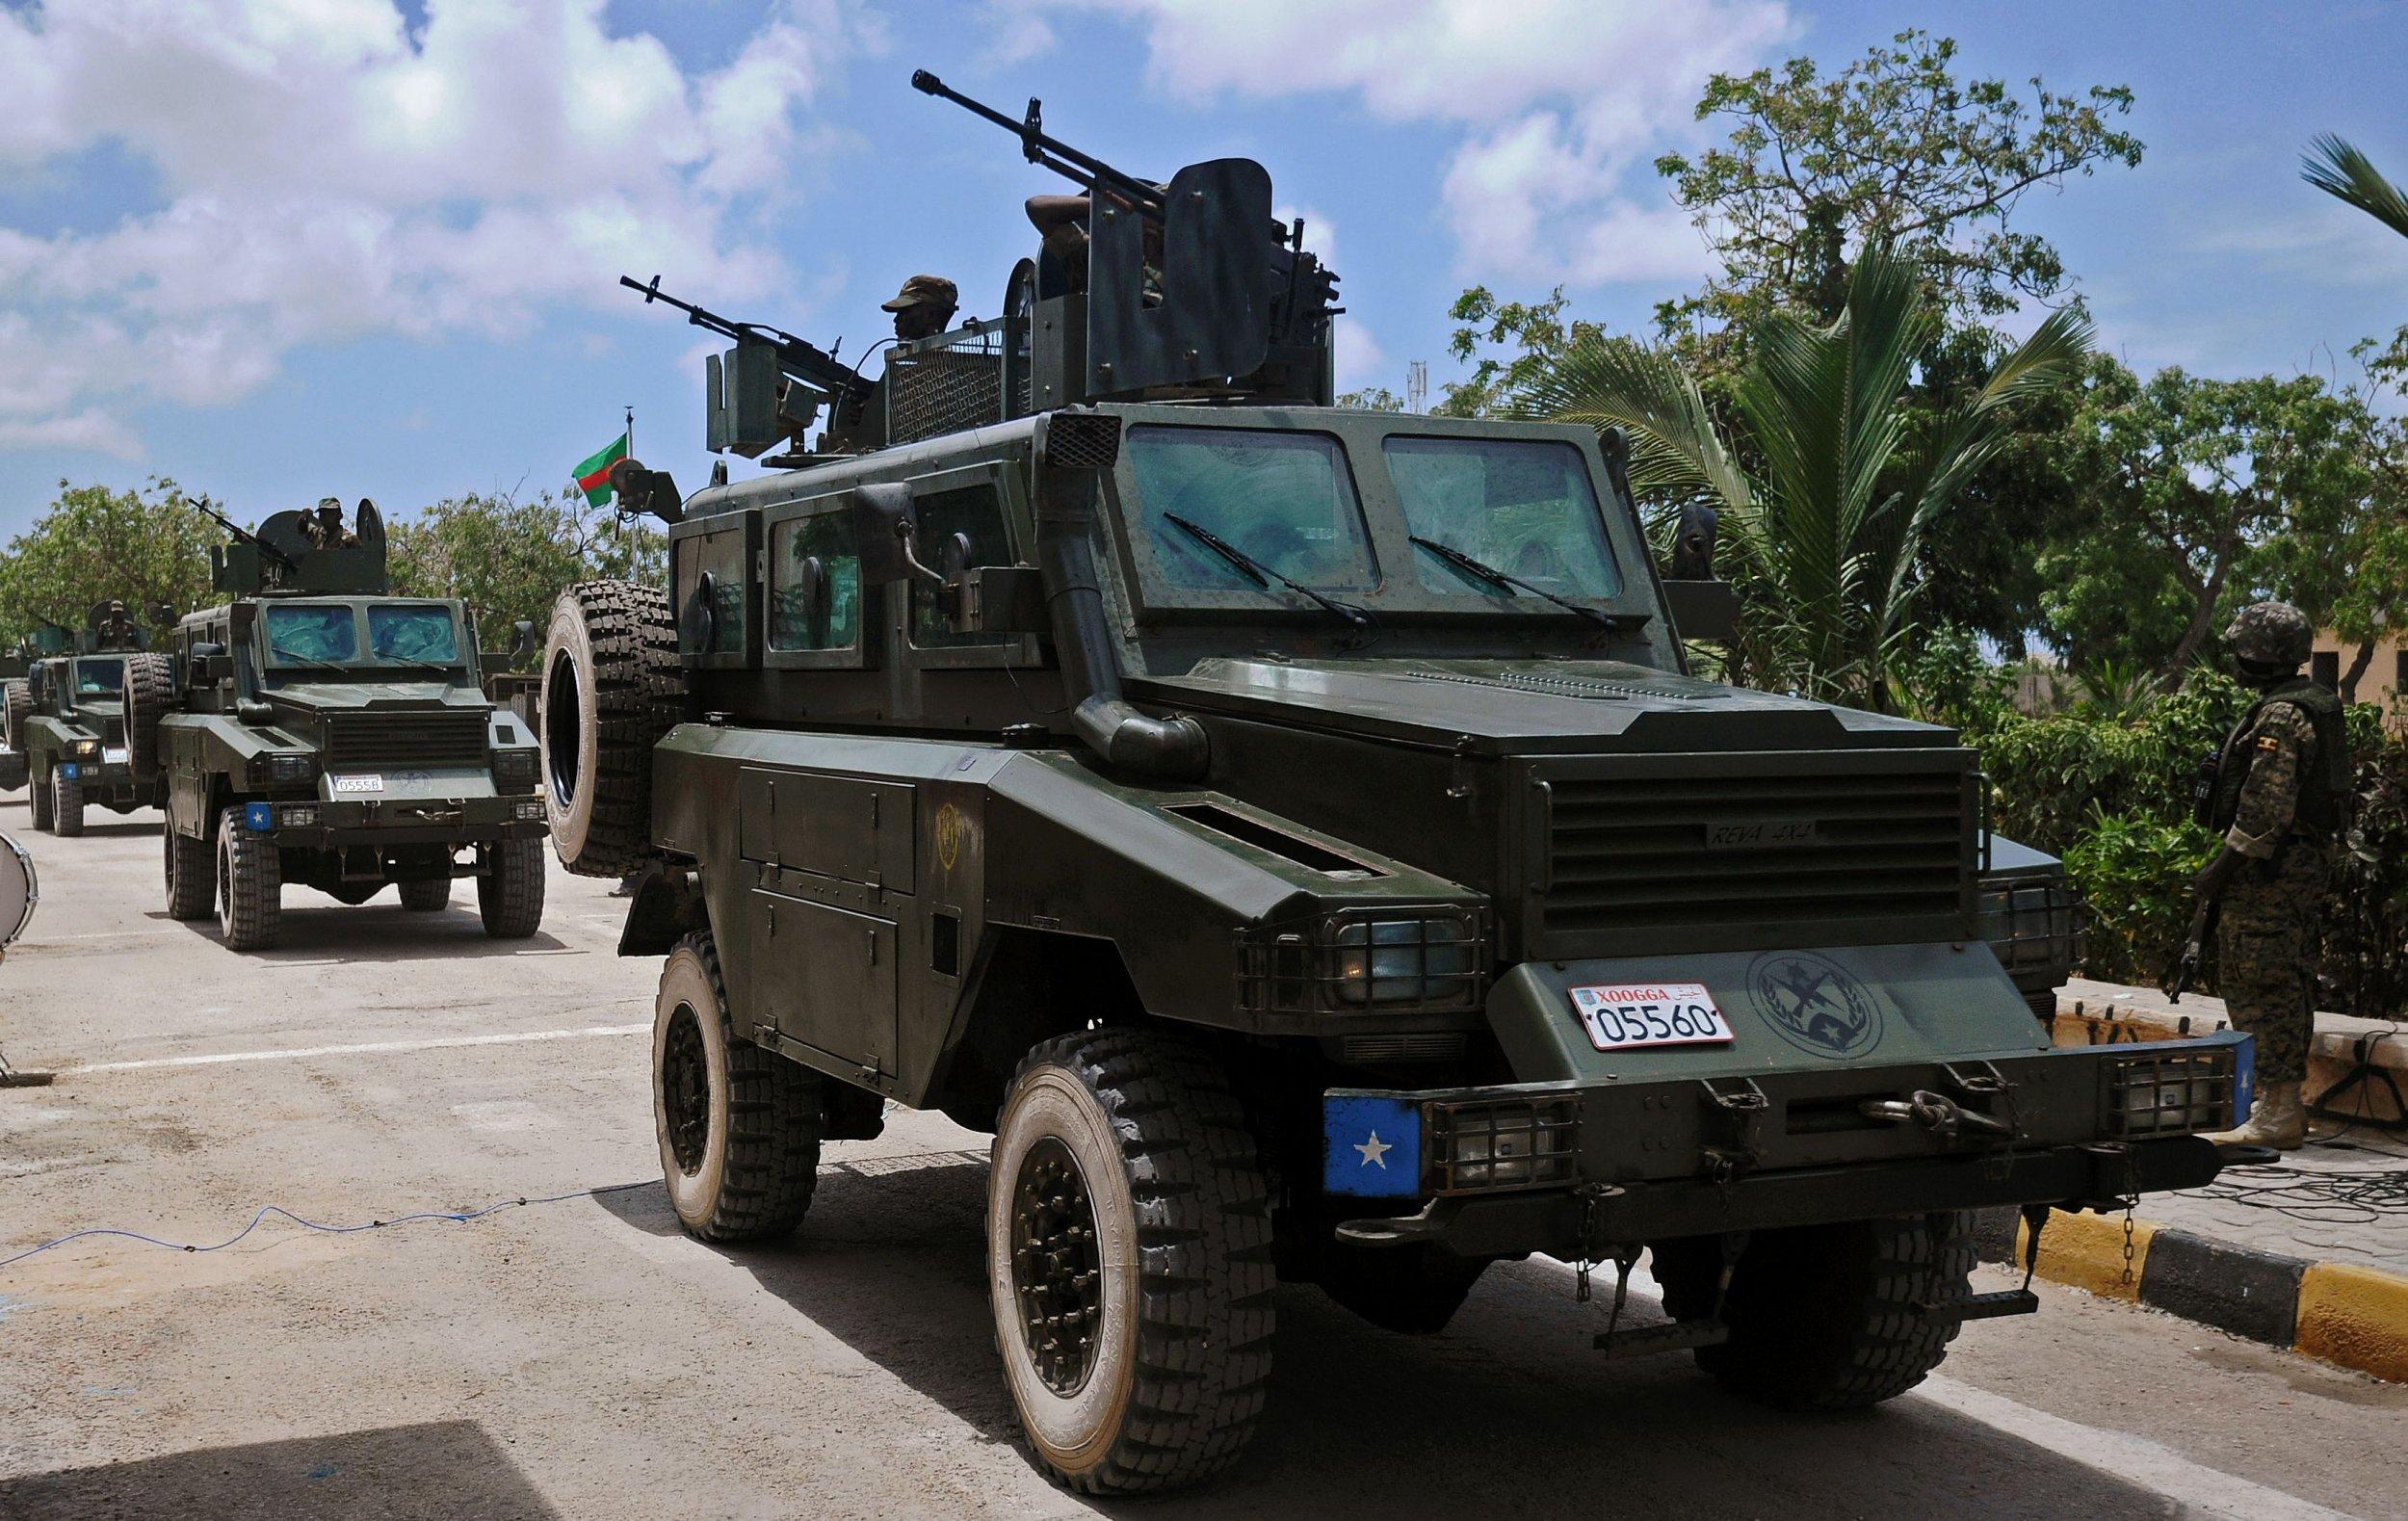 A Somali military truck parades in Mogadishu.